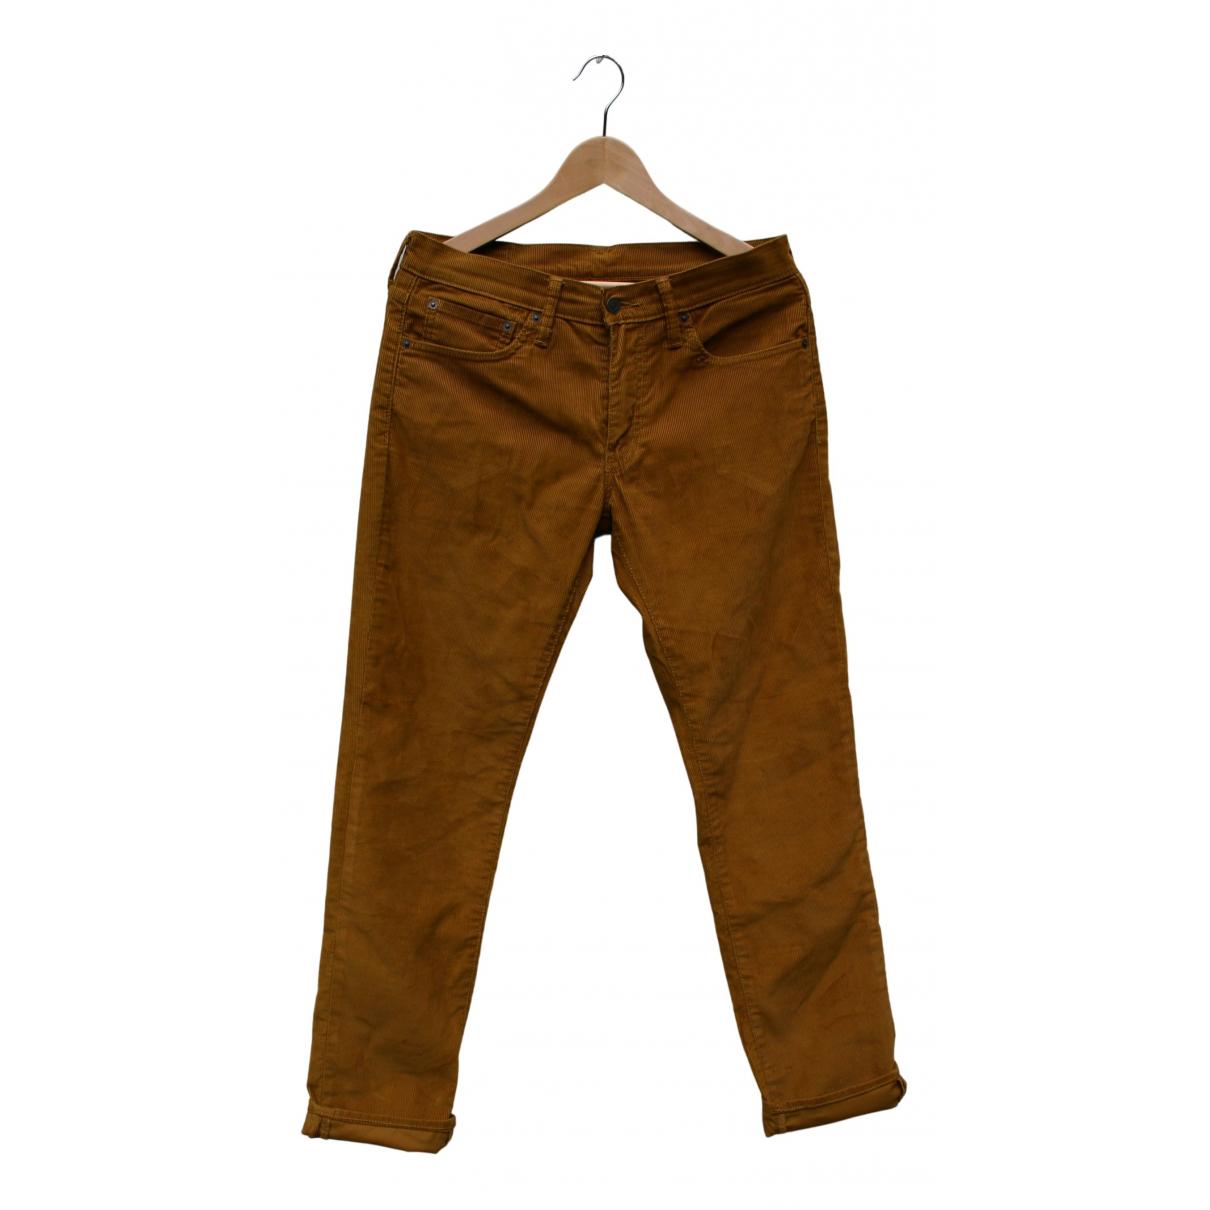 Levi's N Camel Cotton Trousers for Men 32 UK - US